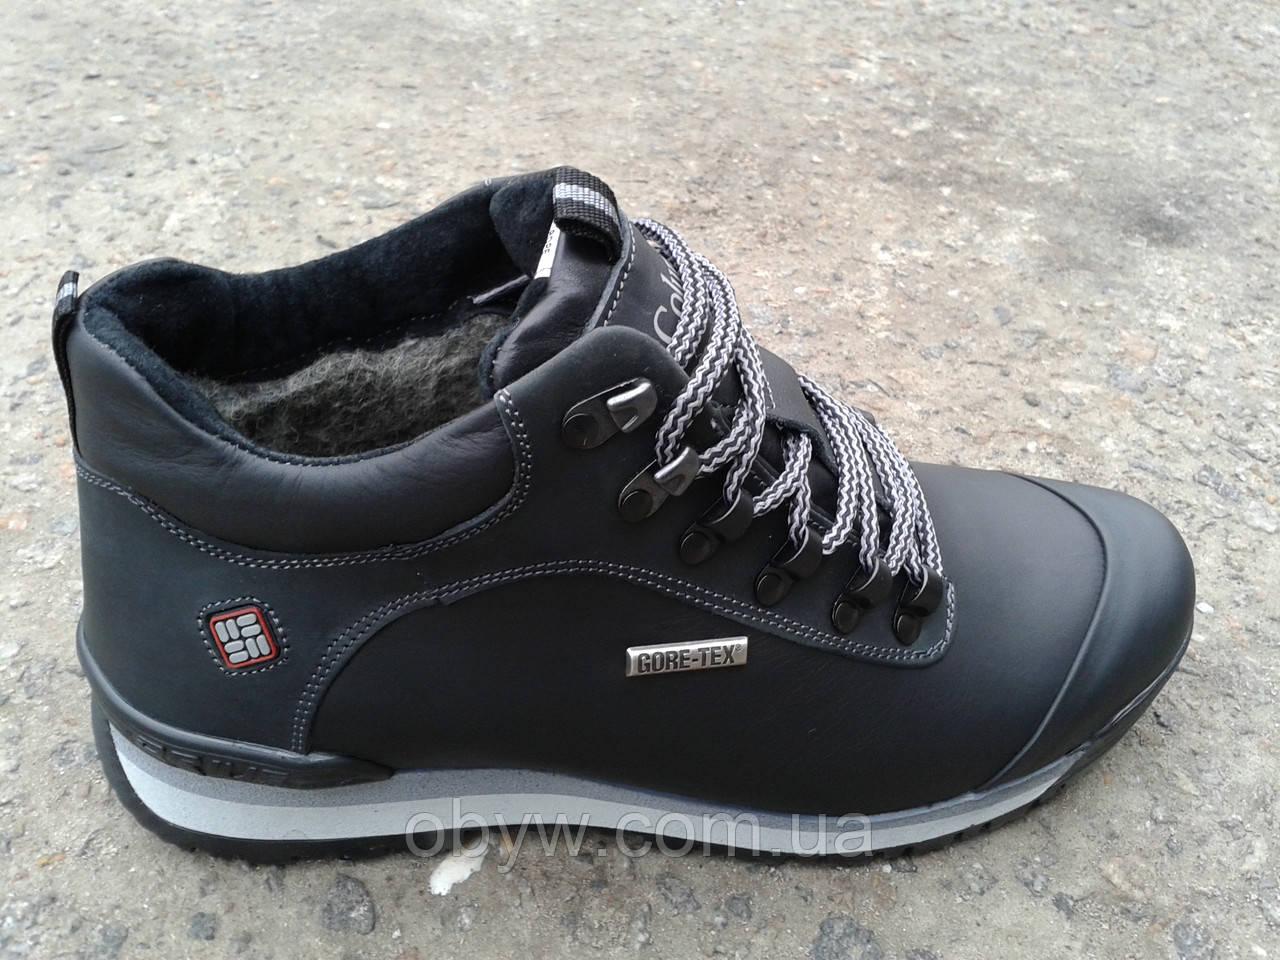 Ботинки Cаlambia  кожаные